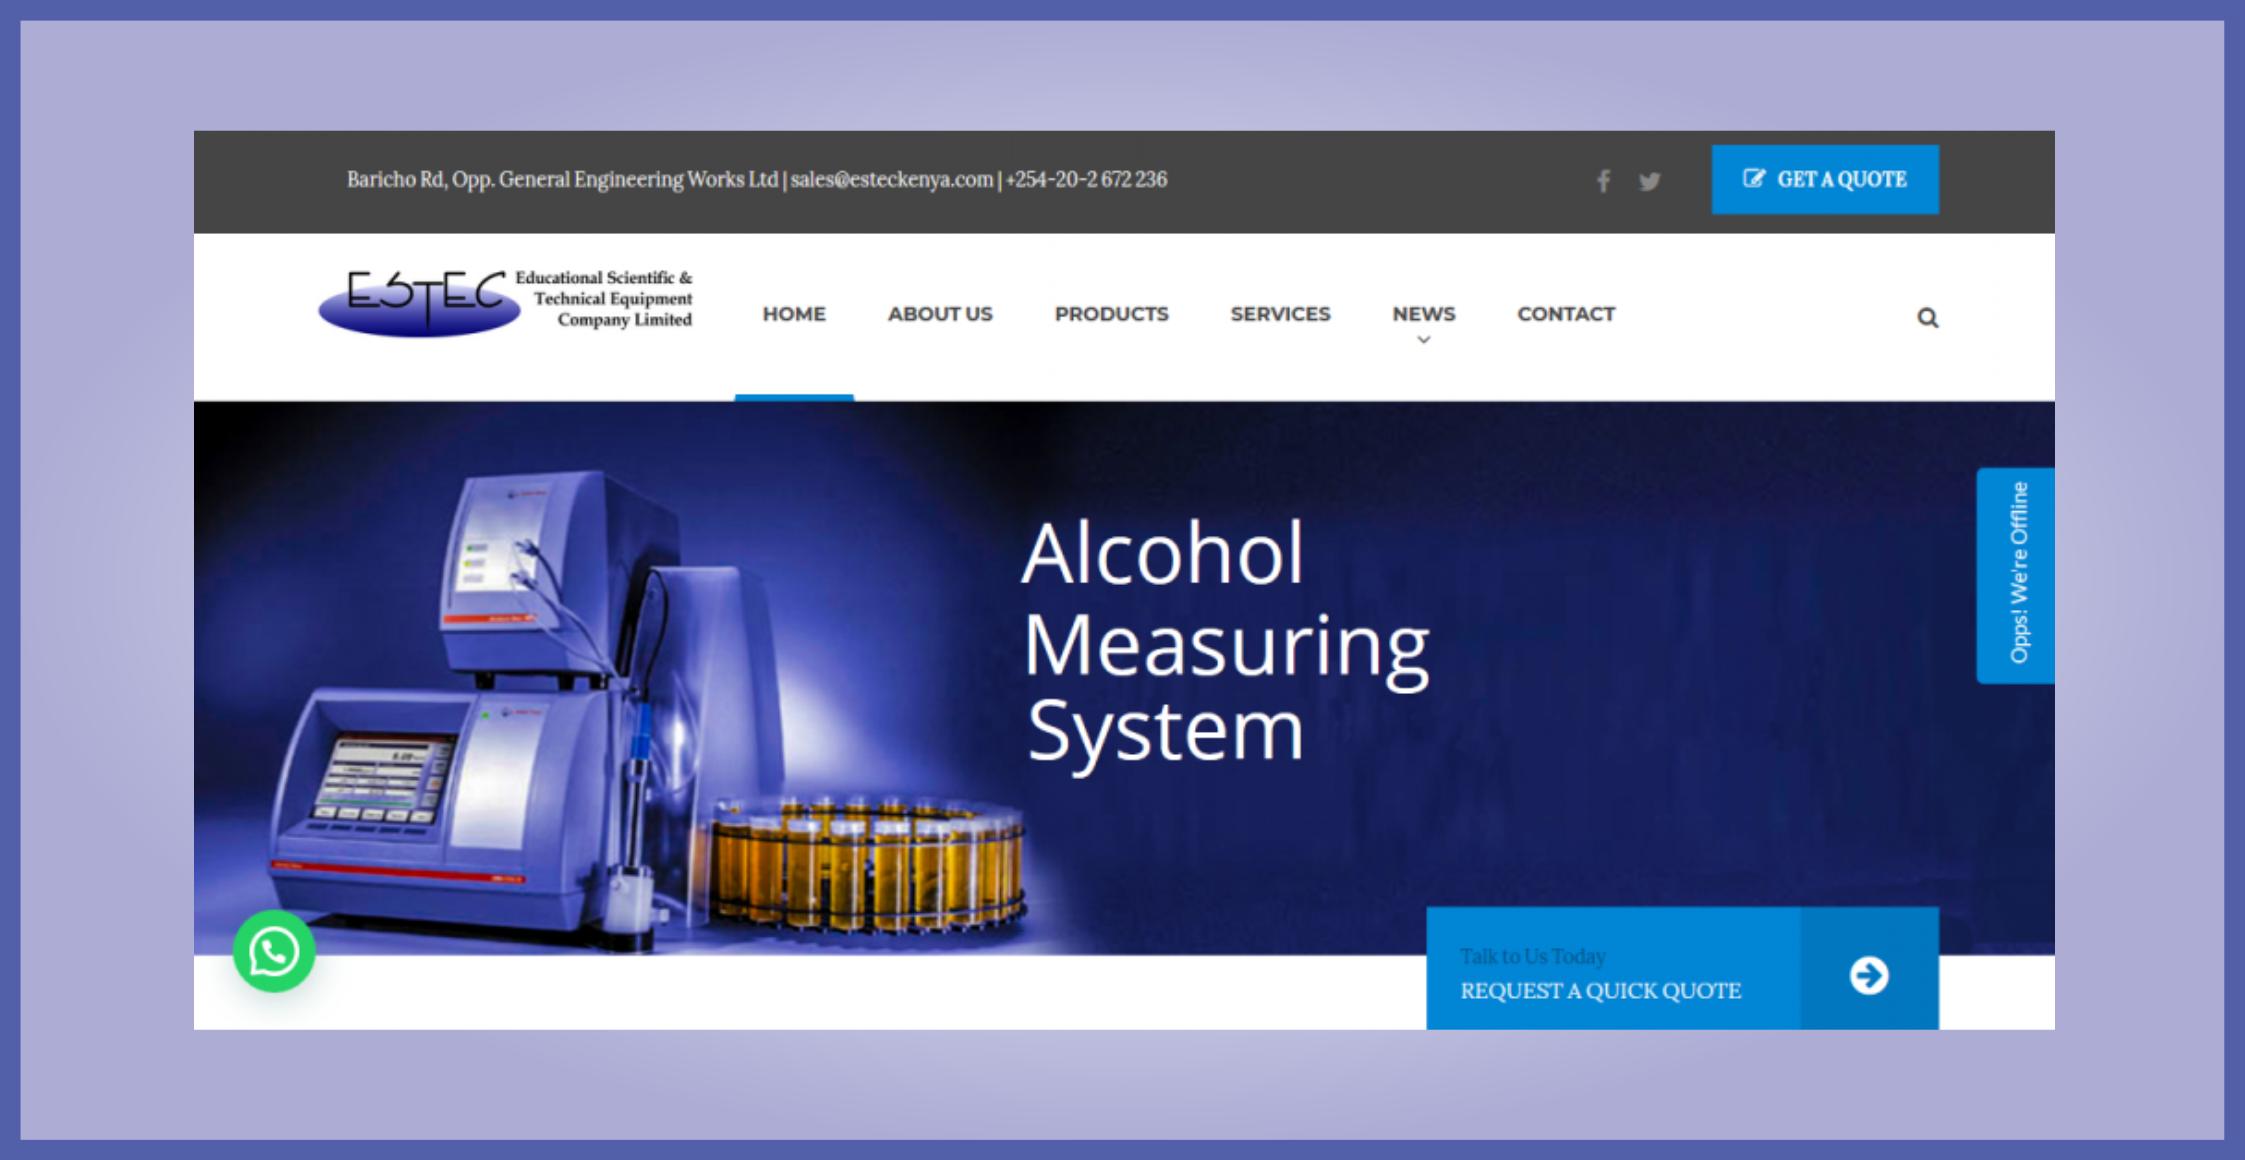 EstecKenya.com - Educational Scientific & Technical Company